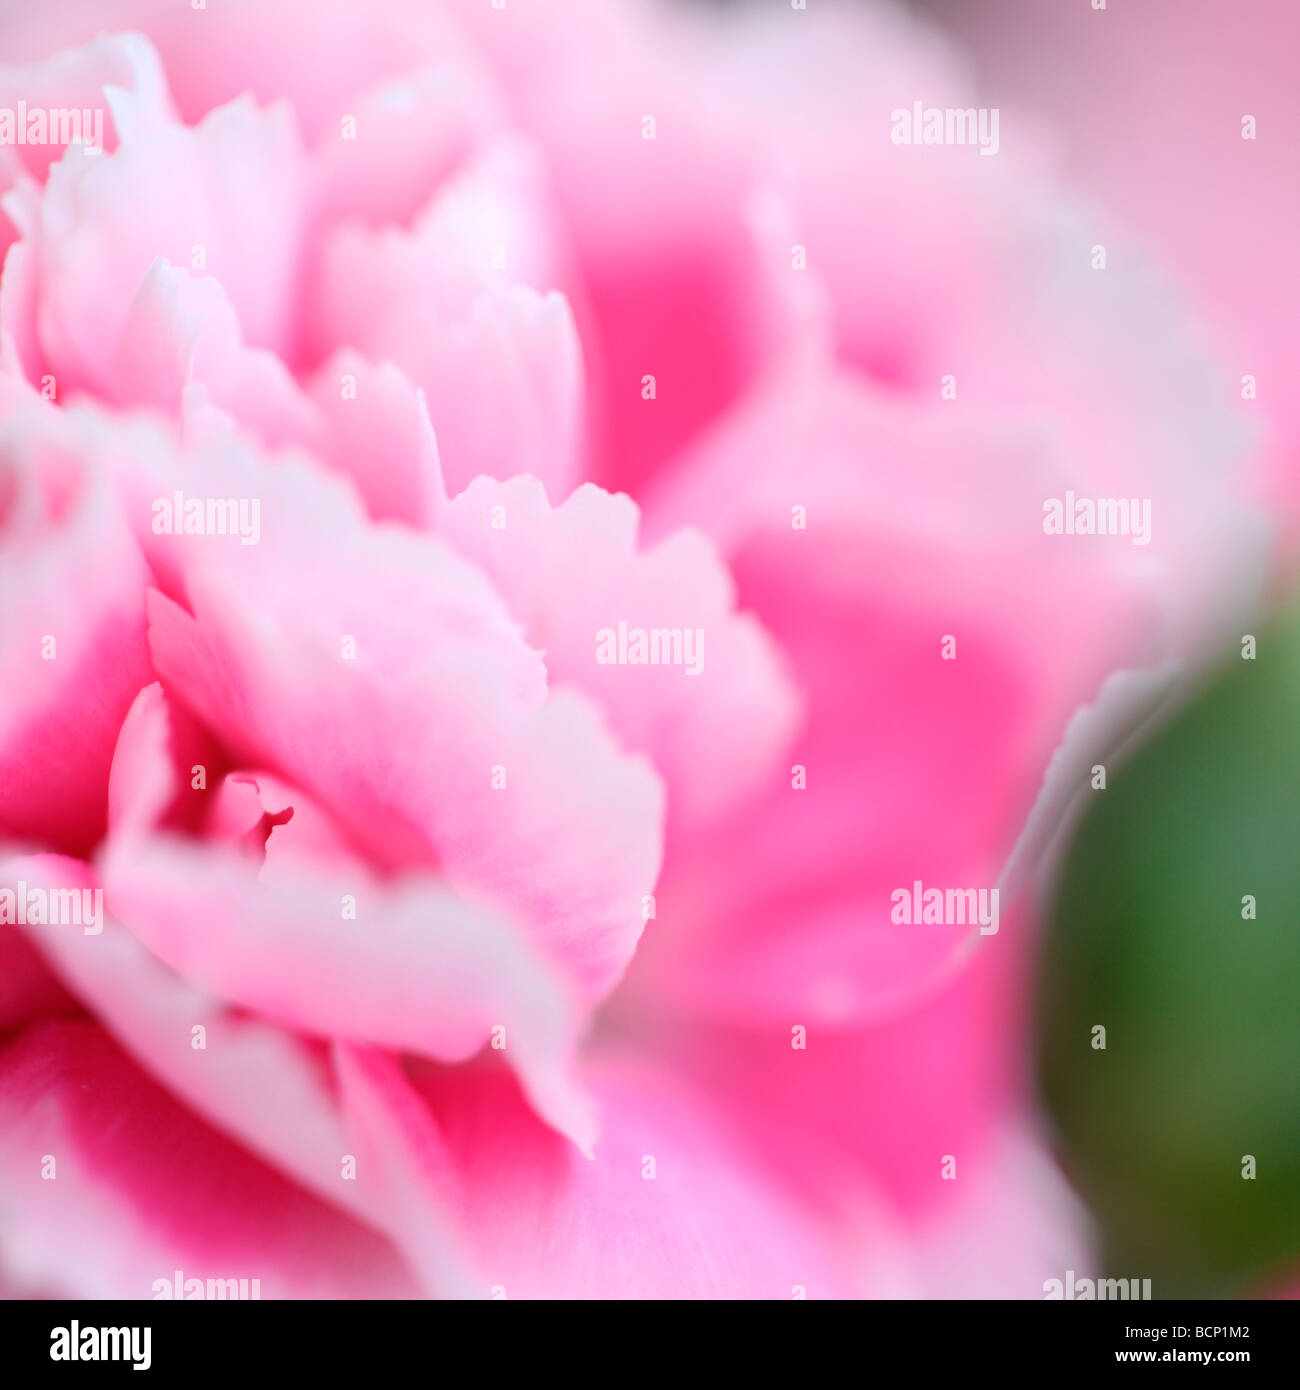 Immagine eterea di garofano e bud arte fotografia Jane Ann Butler JABP Fotografia377 Immagini Stock